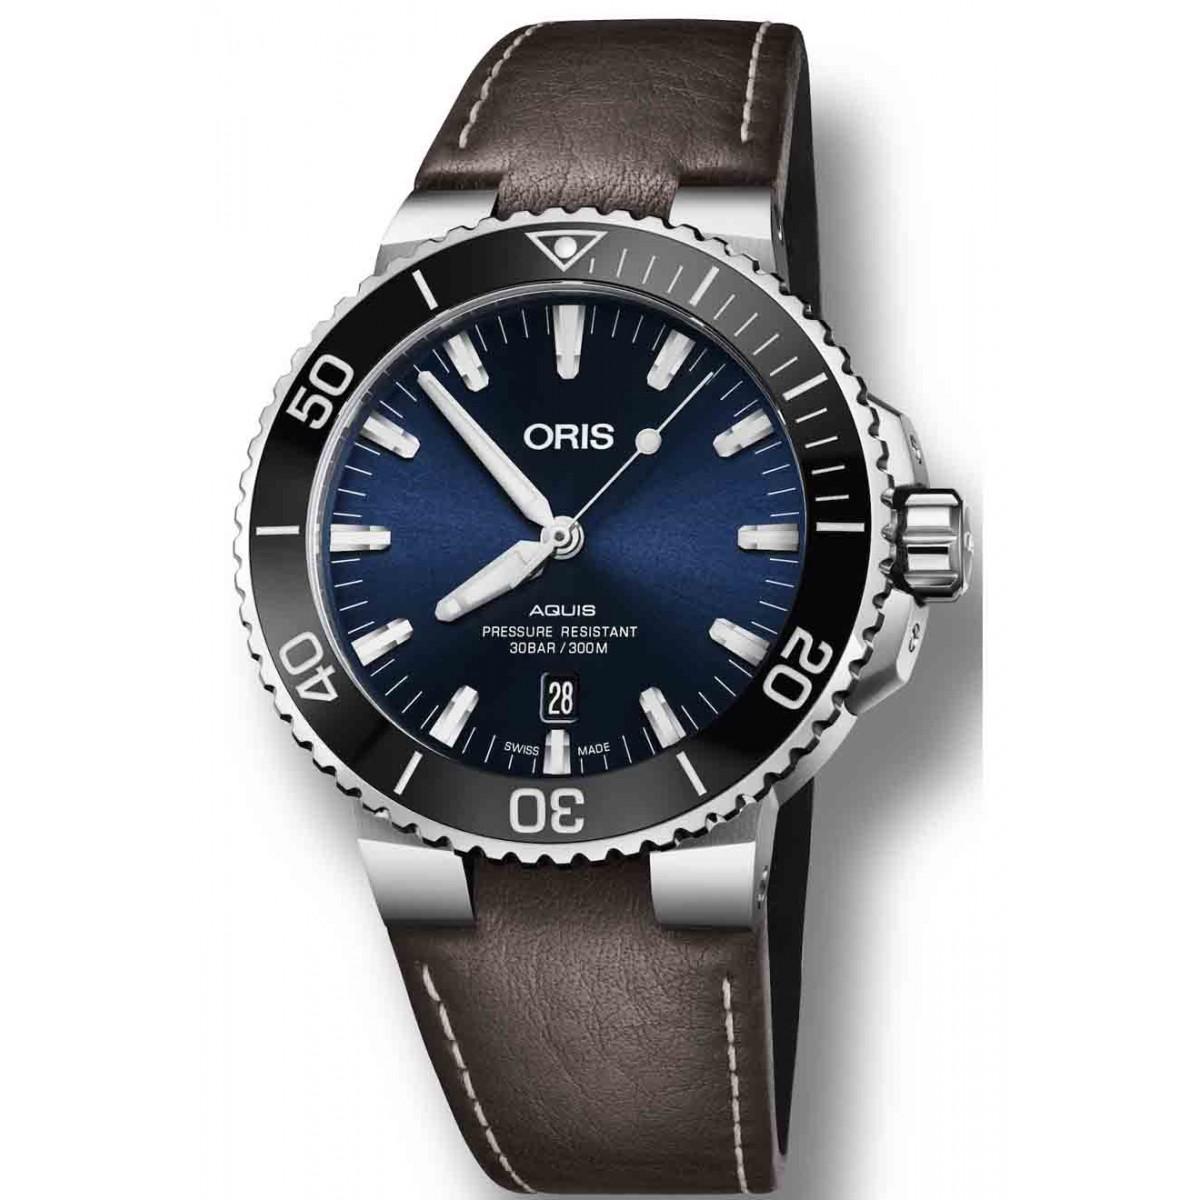 ORIS AQUIS DATE -300 M ∅43,5 mm, Esfera azul, bisel negro, Piel marrón